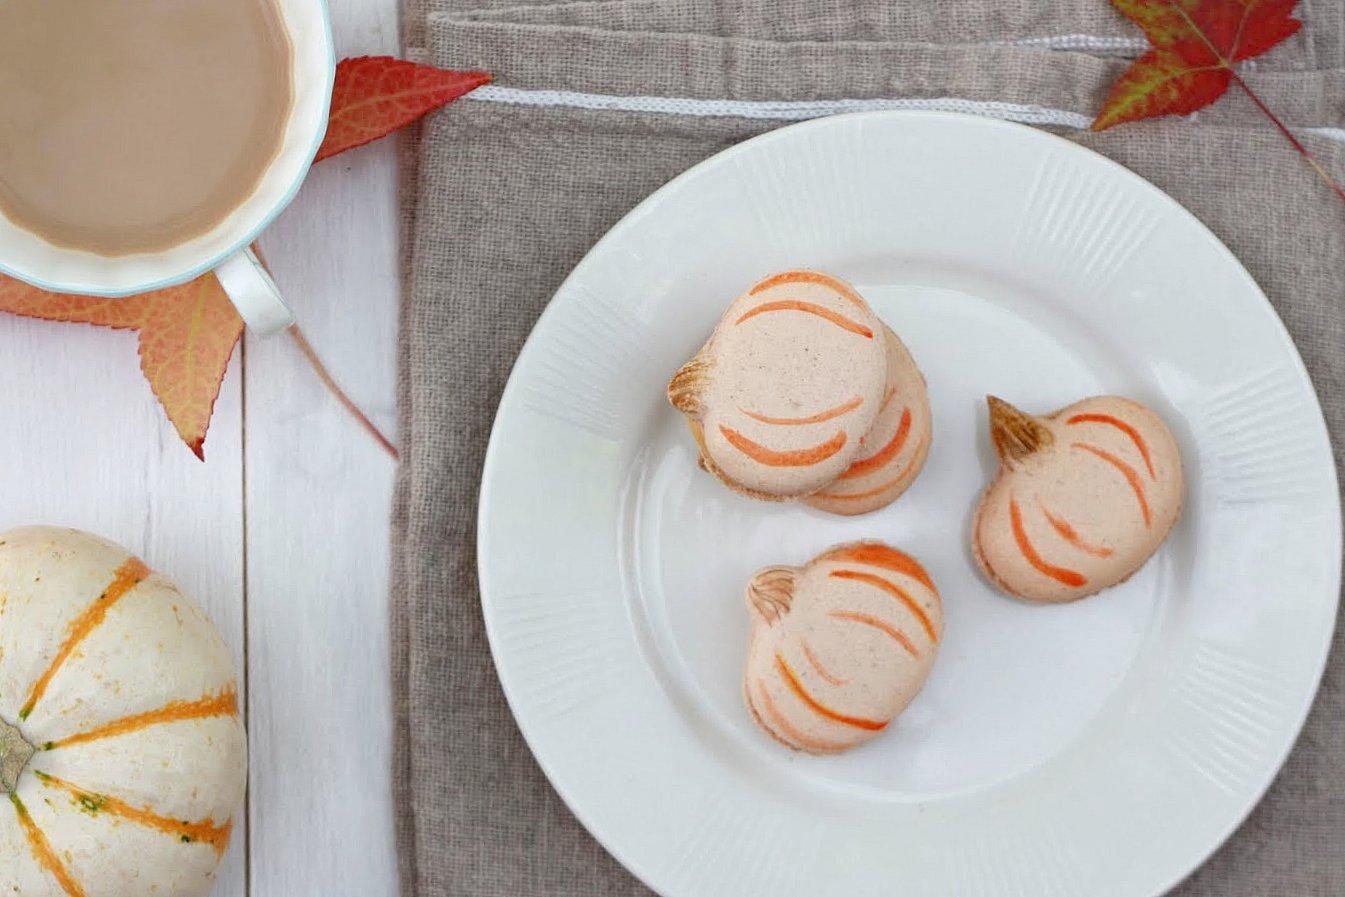 Yummy Mummy Kitchen: Pumpkin French Macarons